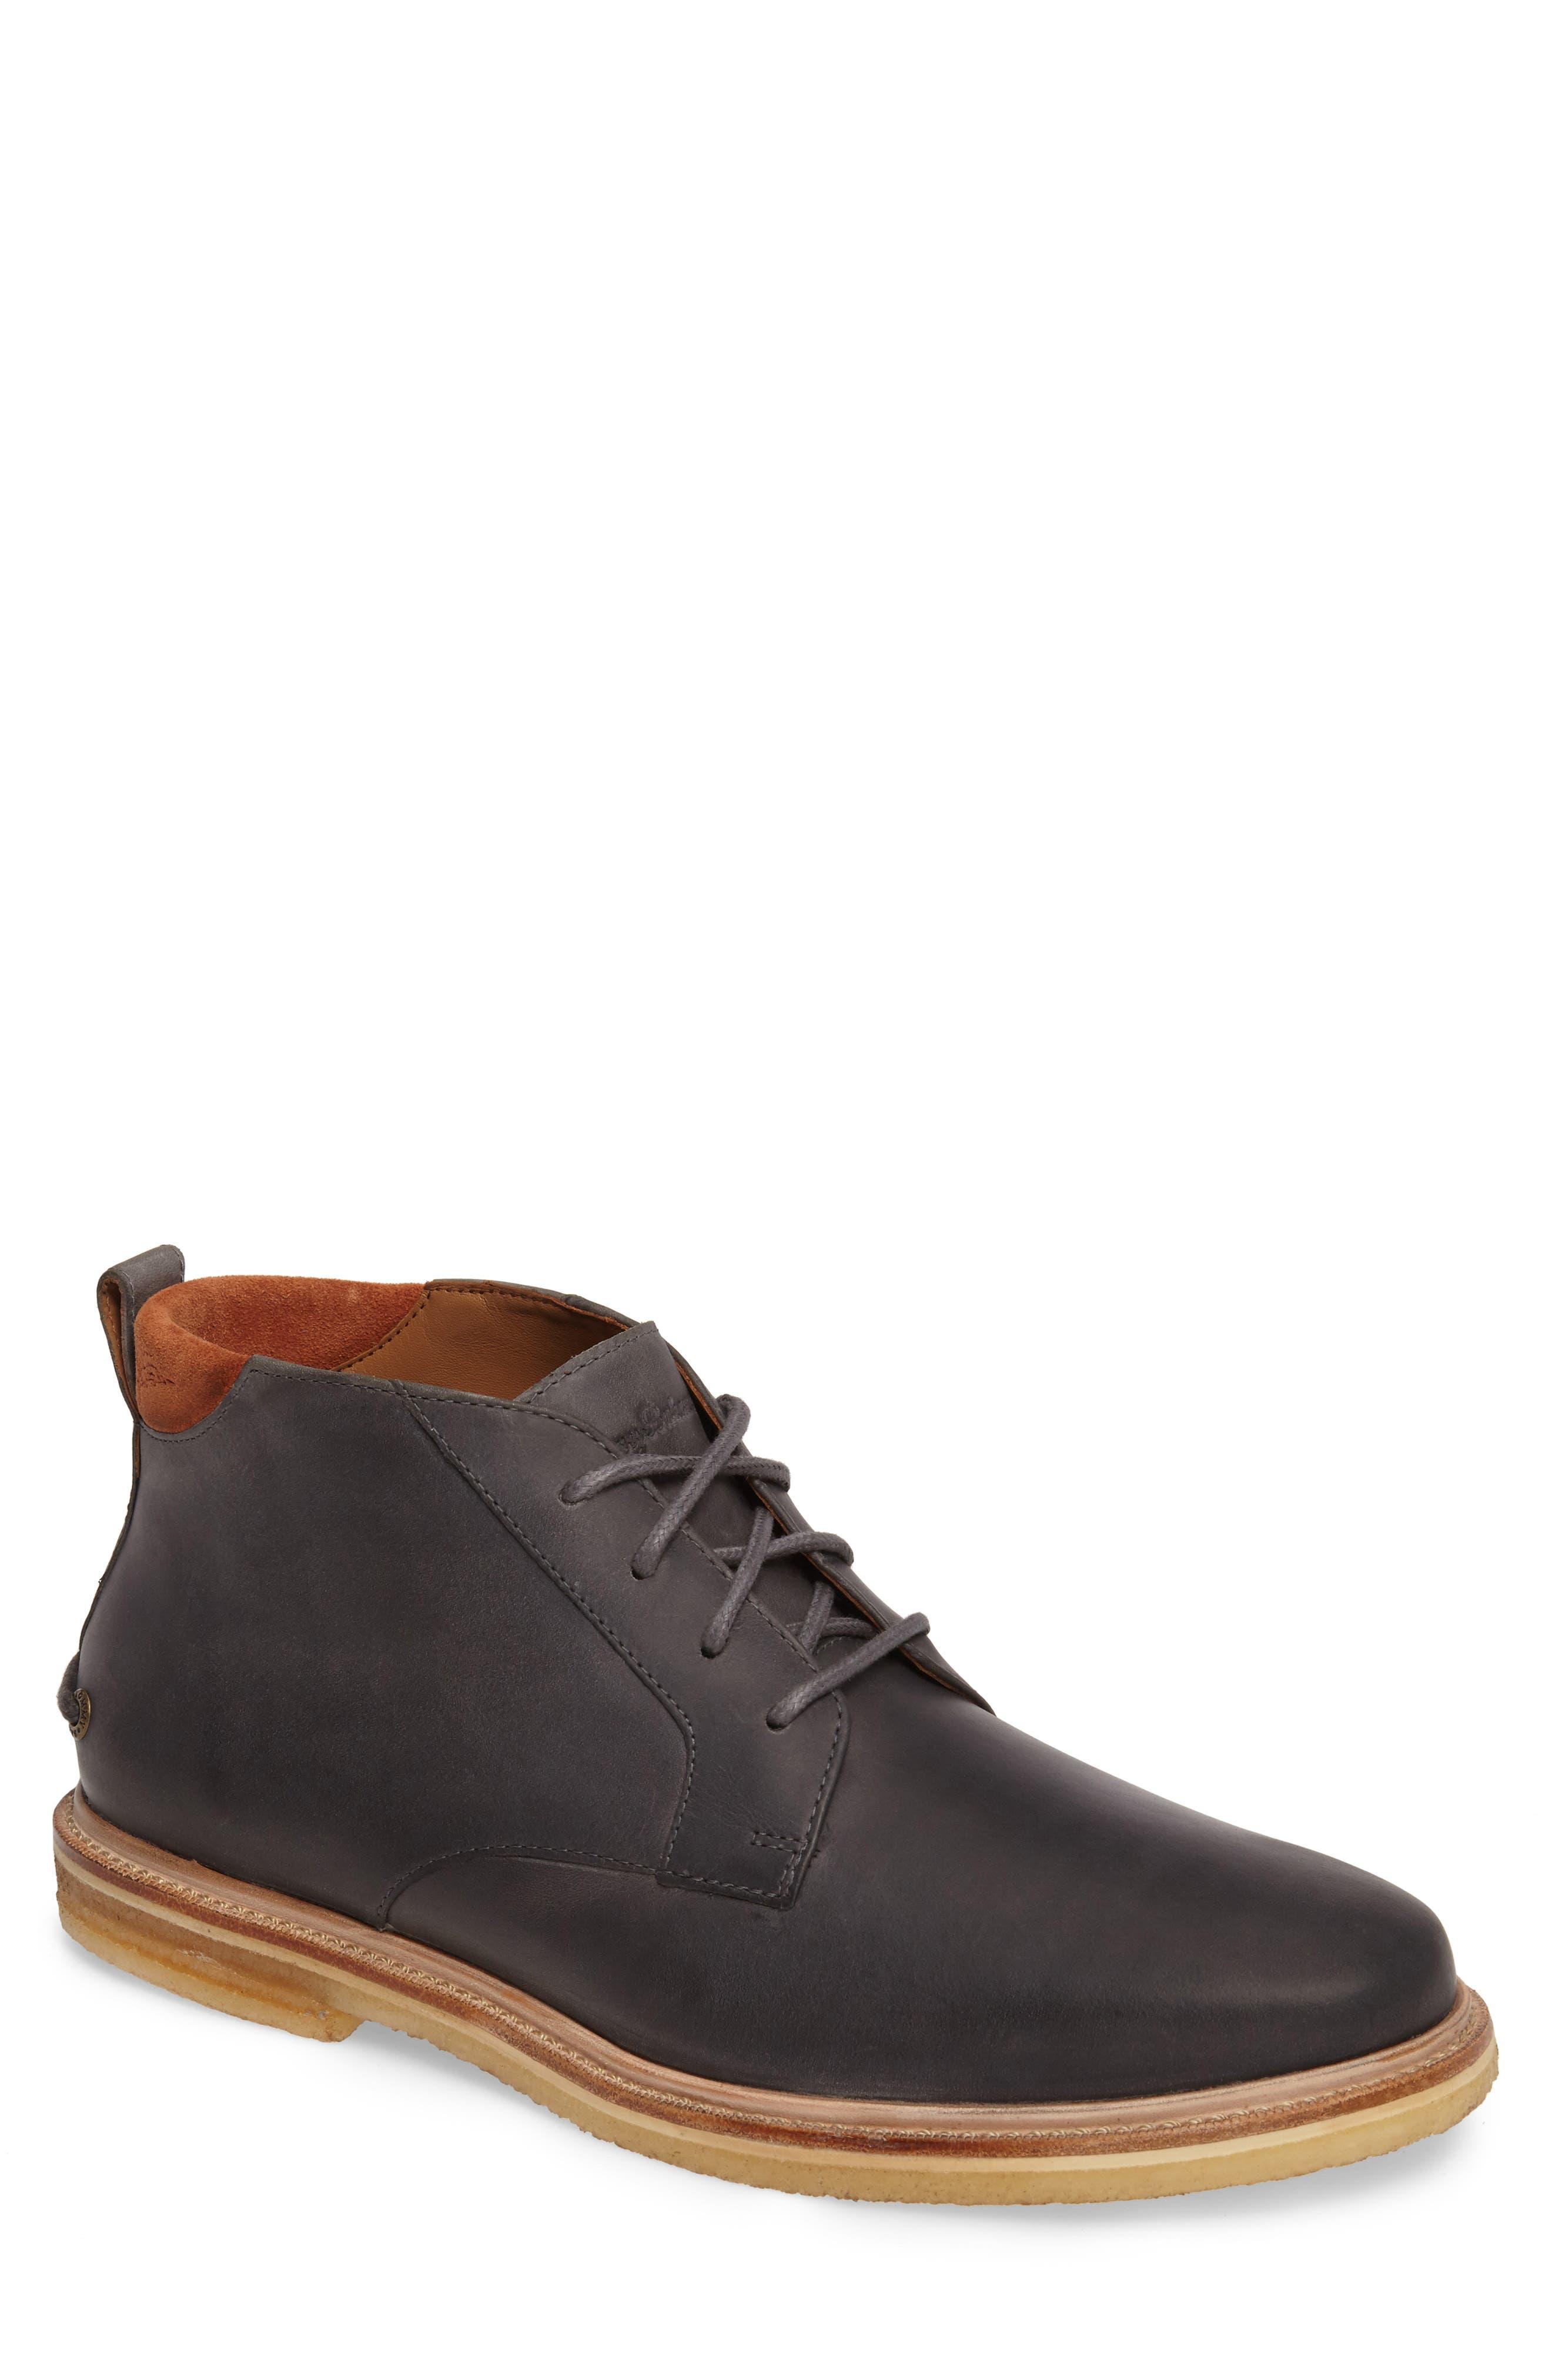 Lancaster Chukka Boot,                         Main,                         color,